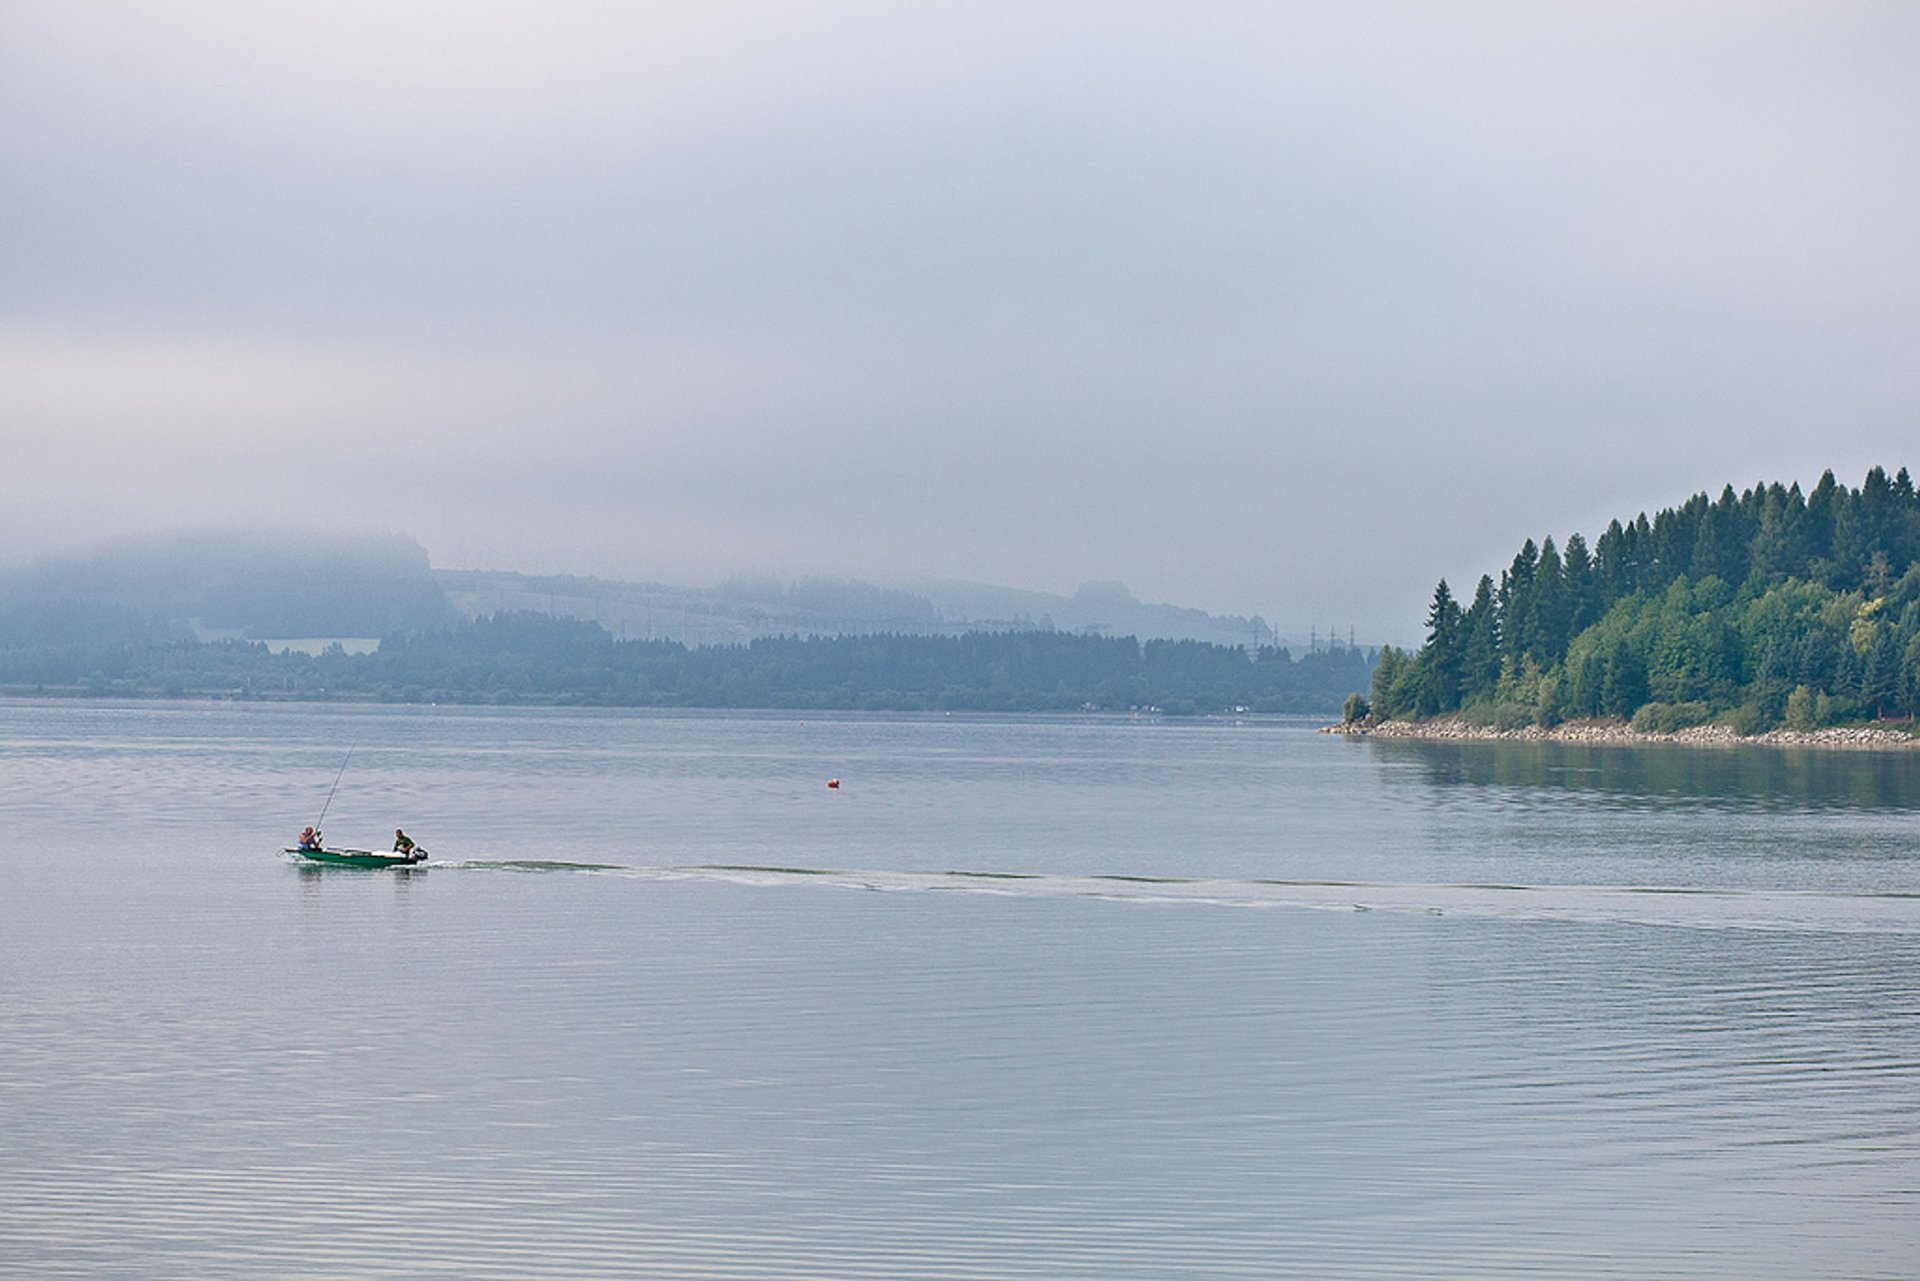 Reservoir in northern Slovakia—Liptovská Mara